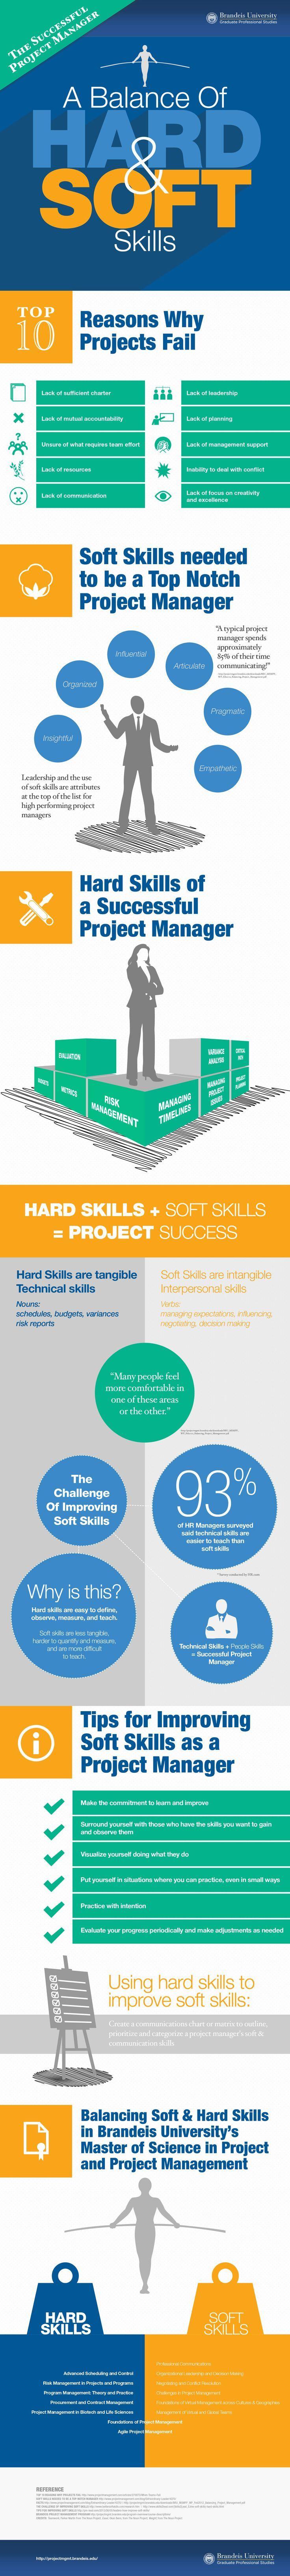 Project management skills: Project management skills http://snip.ly/kcXc?utm_content=buffer375b9&utm_medium=social&utm_source=pinterest.com&utm_campaign=buffer